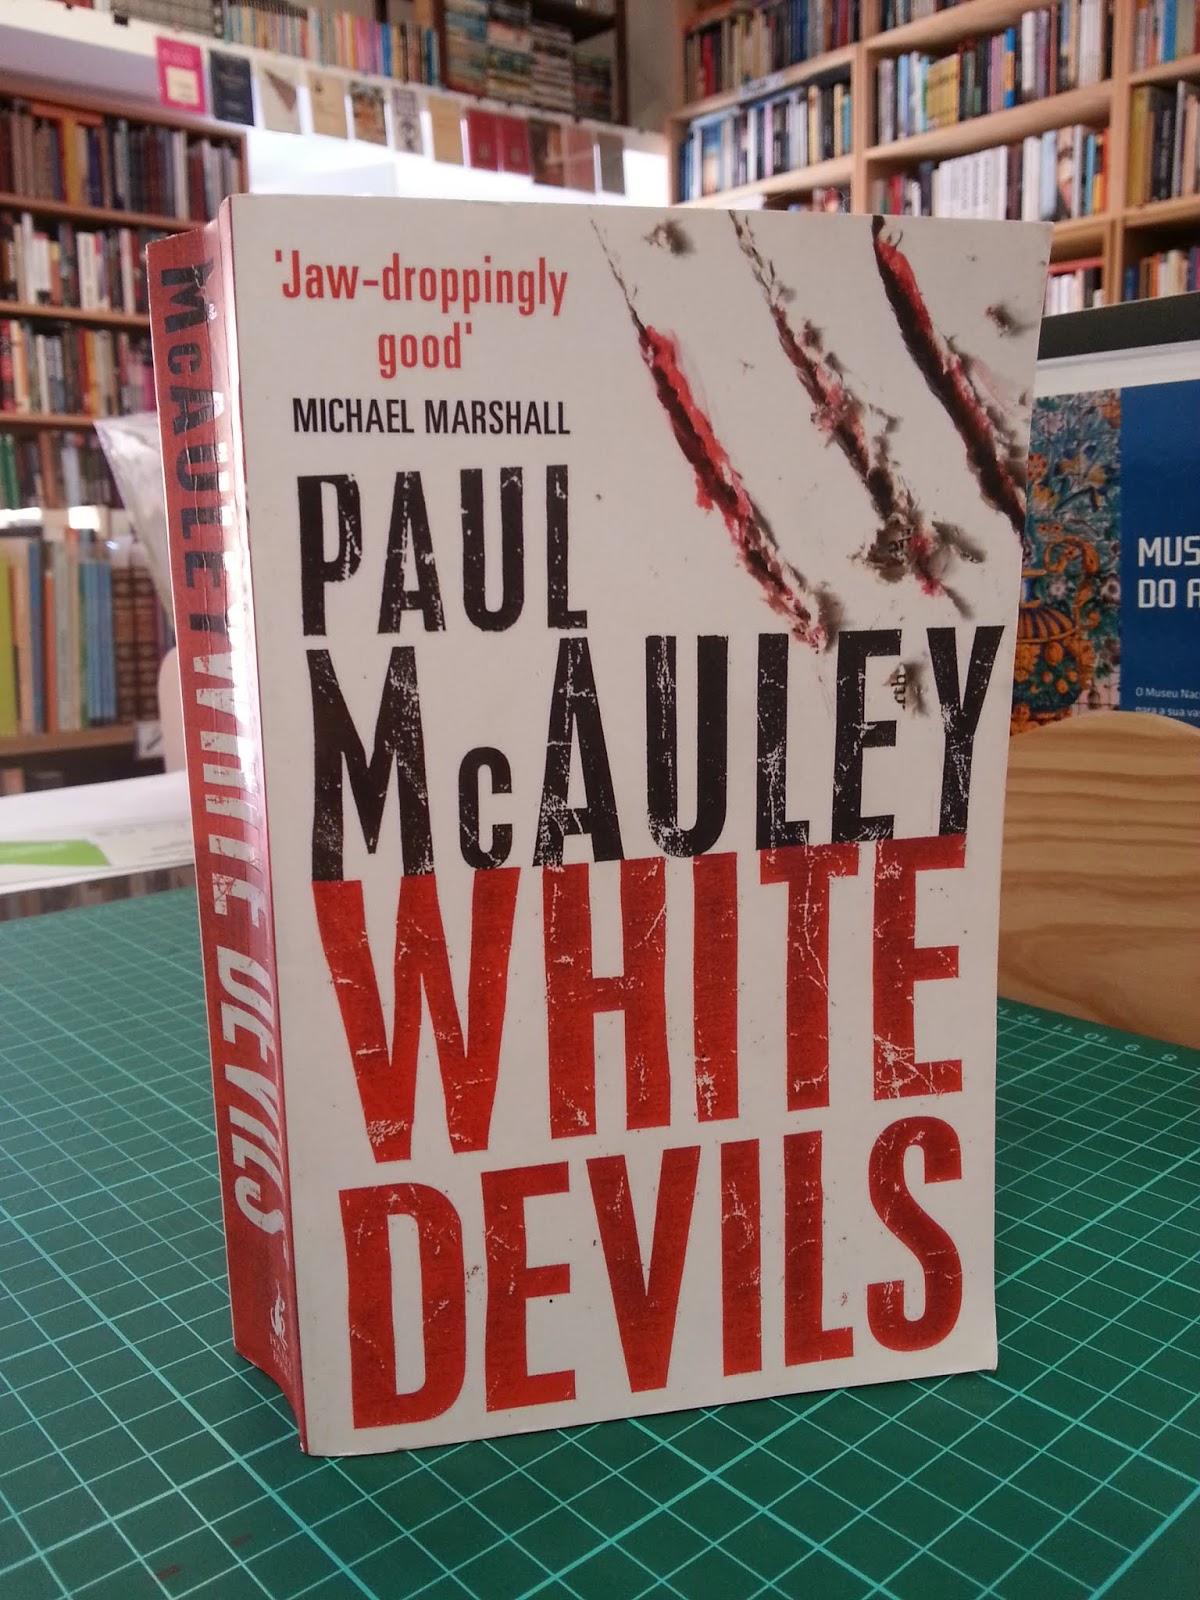 white devils mcauley paul